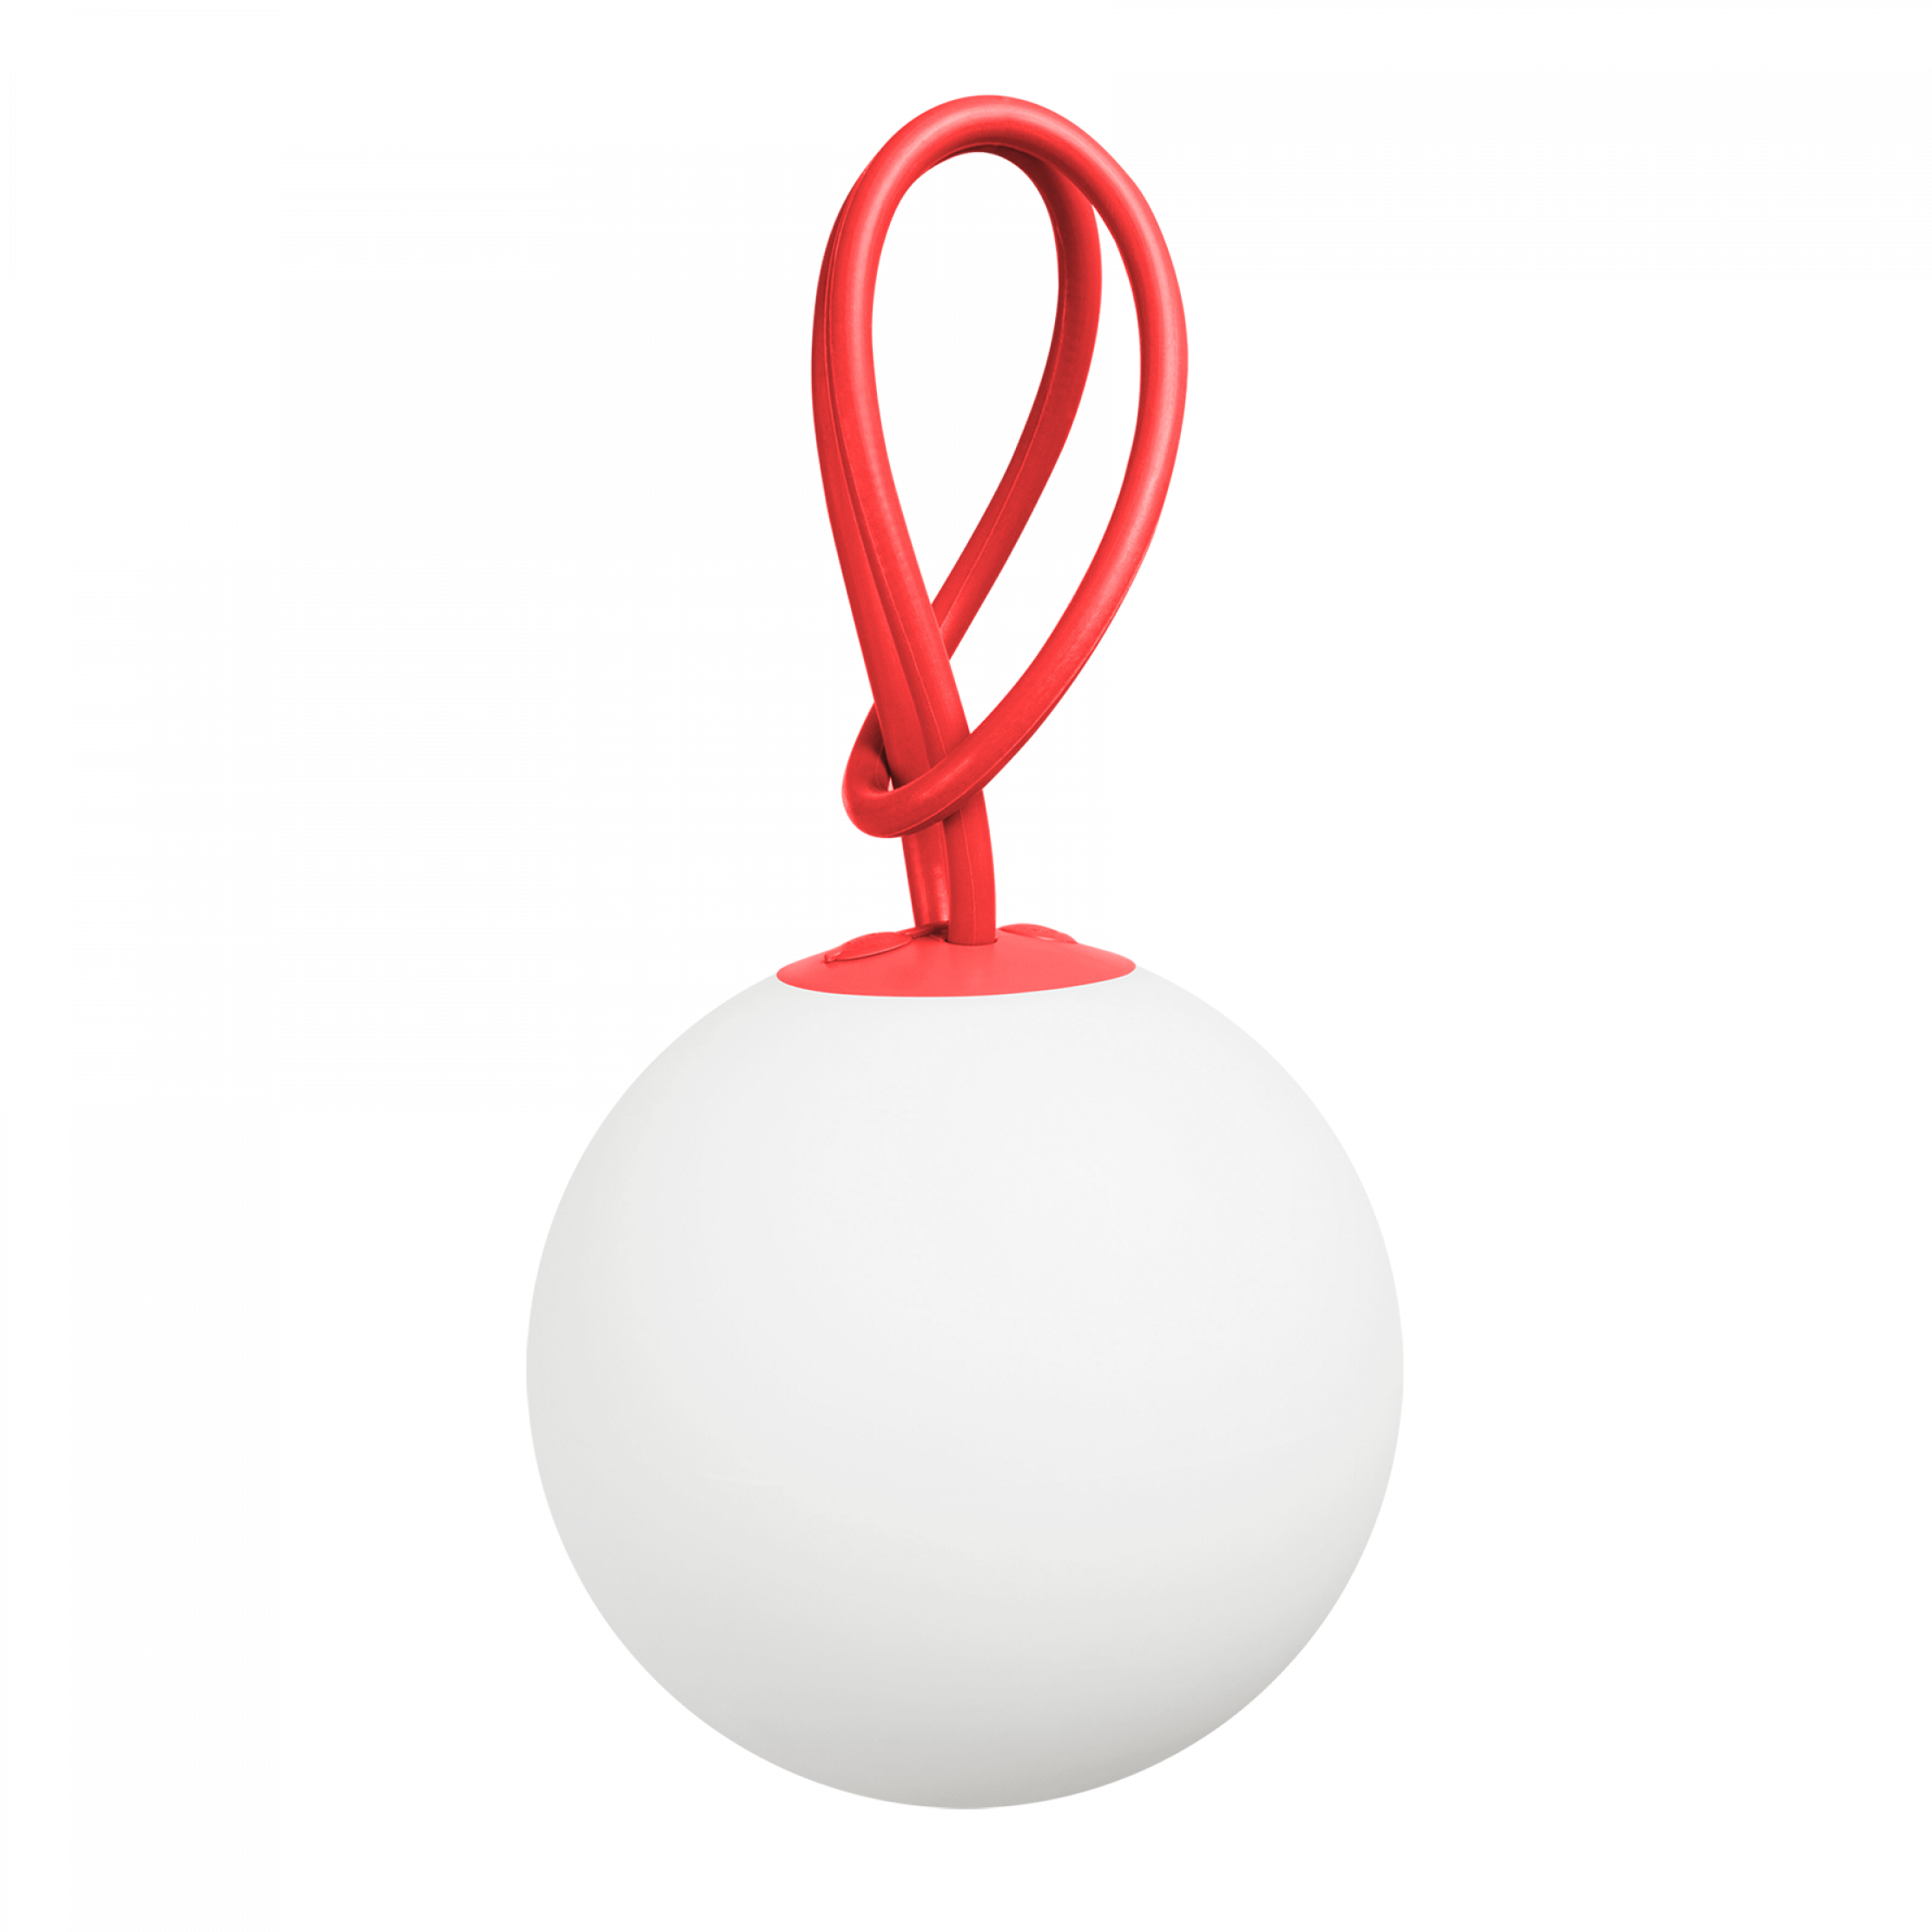 Bolleke Red Bolleke Luminaire Online Shop Fatboy Lamp Portable Light Portable Lamps